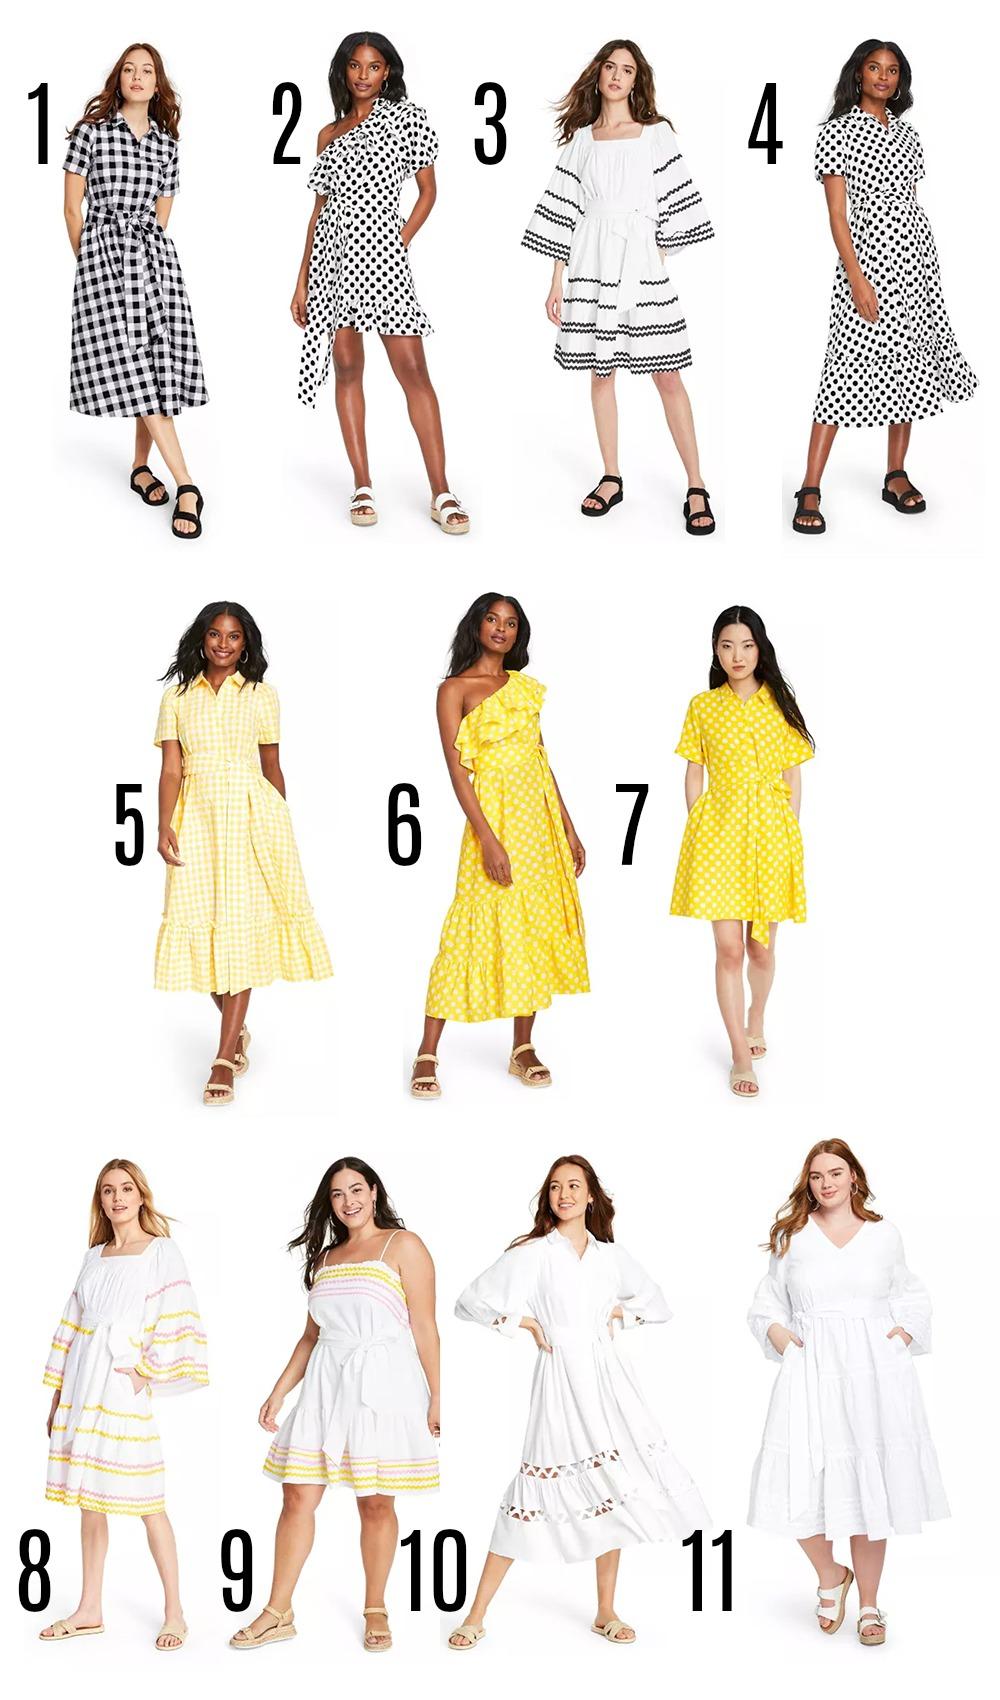 Target Designer Dress Collection for Summer 2020 I Lisa Marie Fernandez Styles on Dreaminlace.com